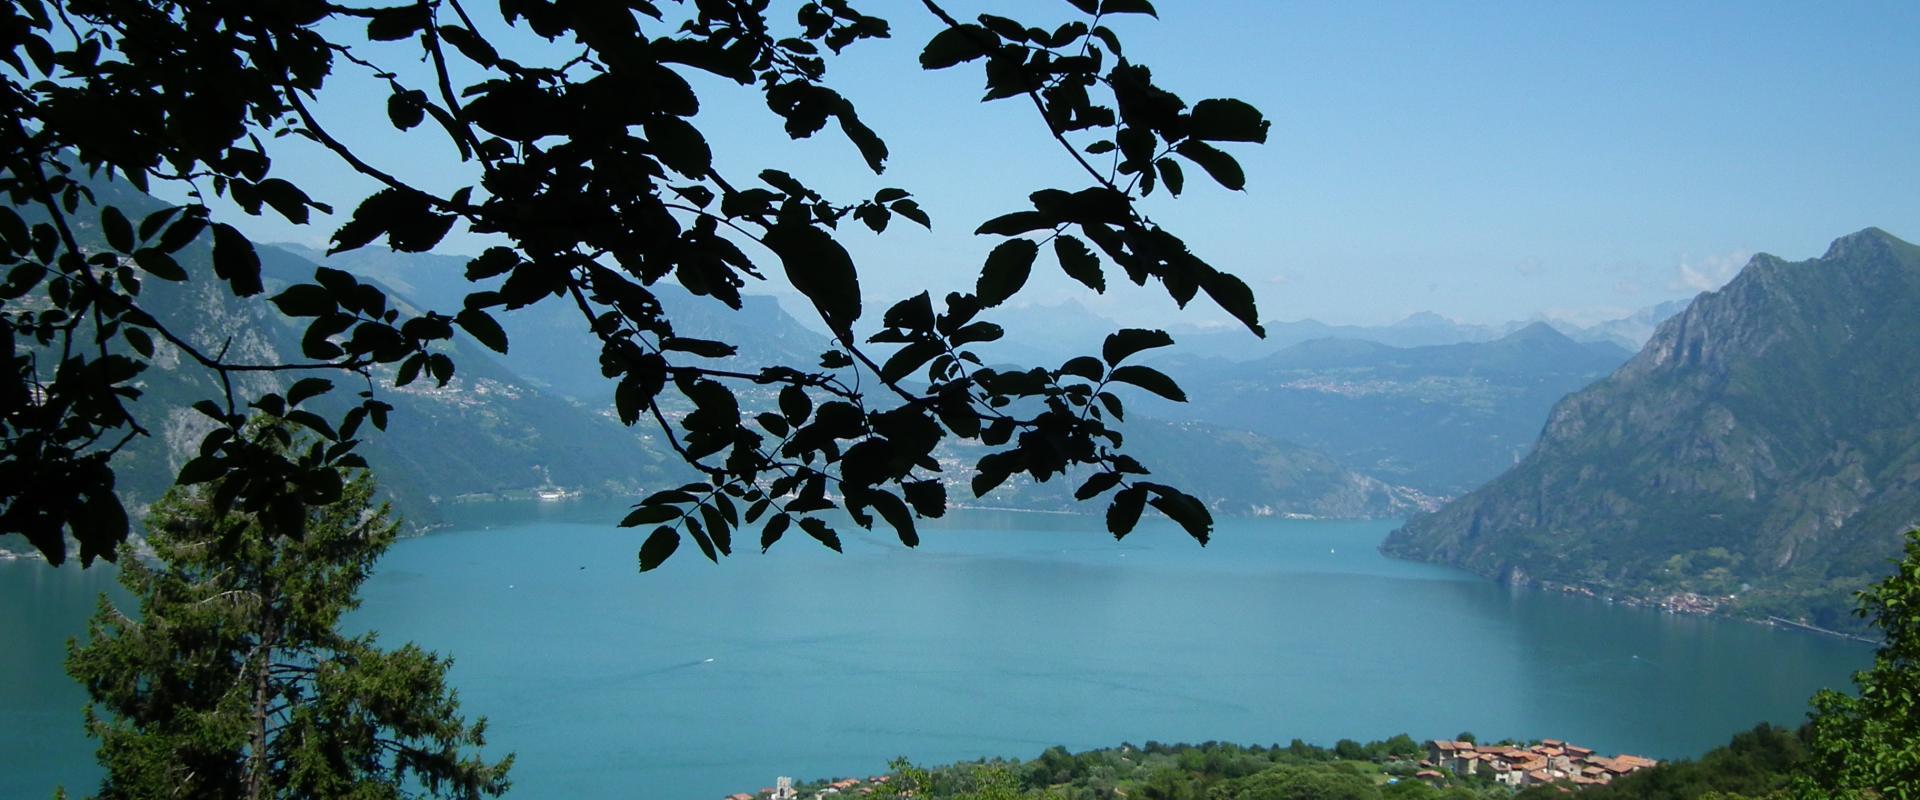 trekking experience on Mmonte Isola